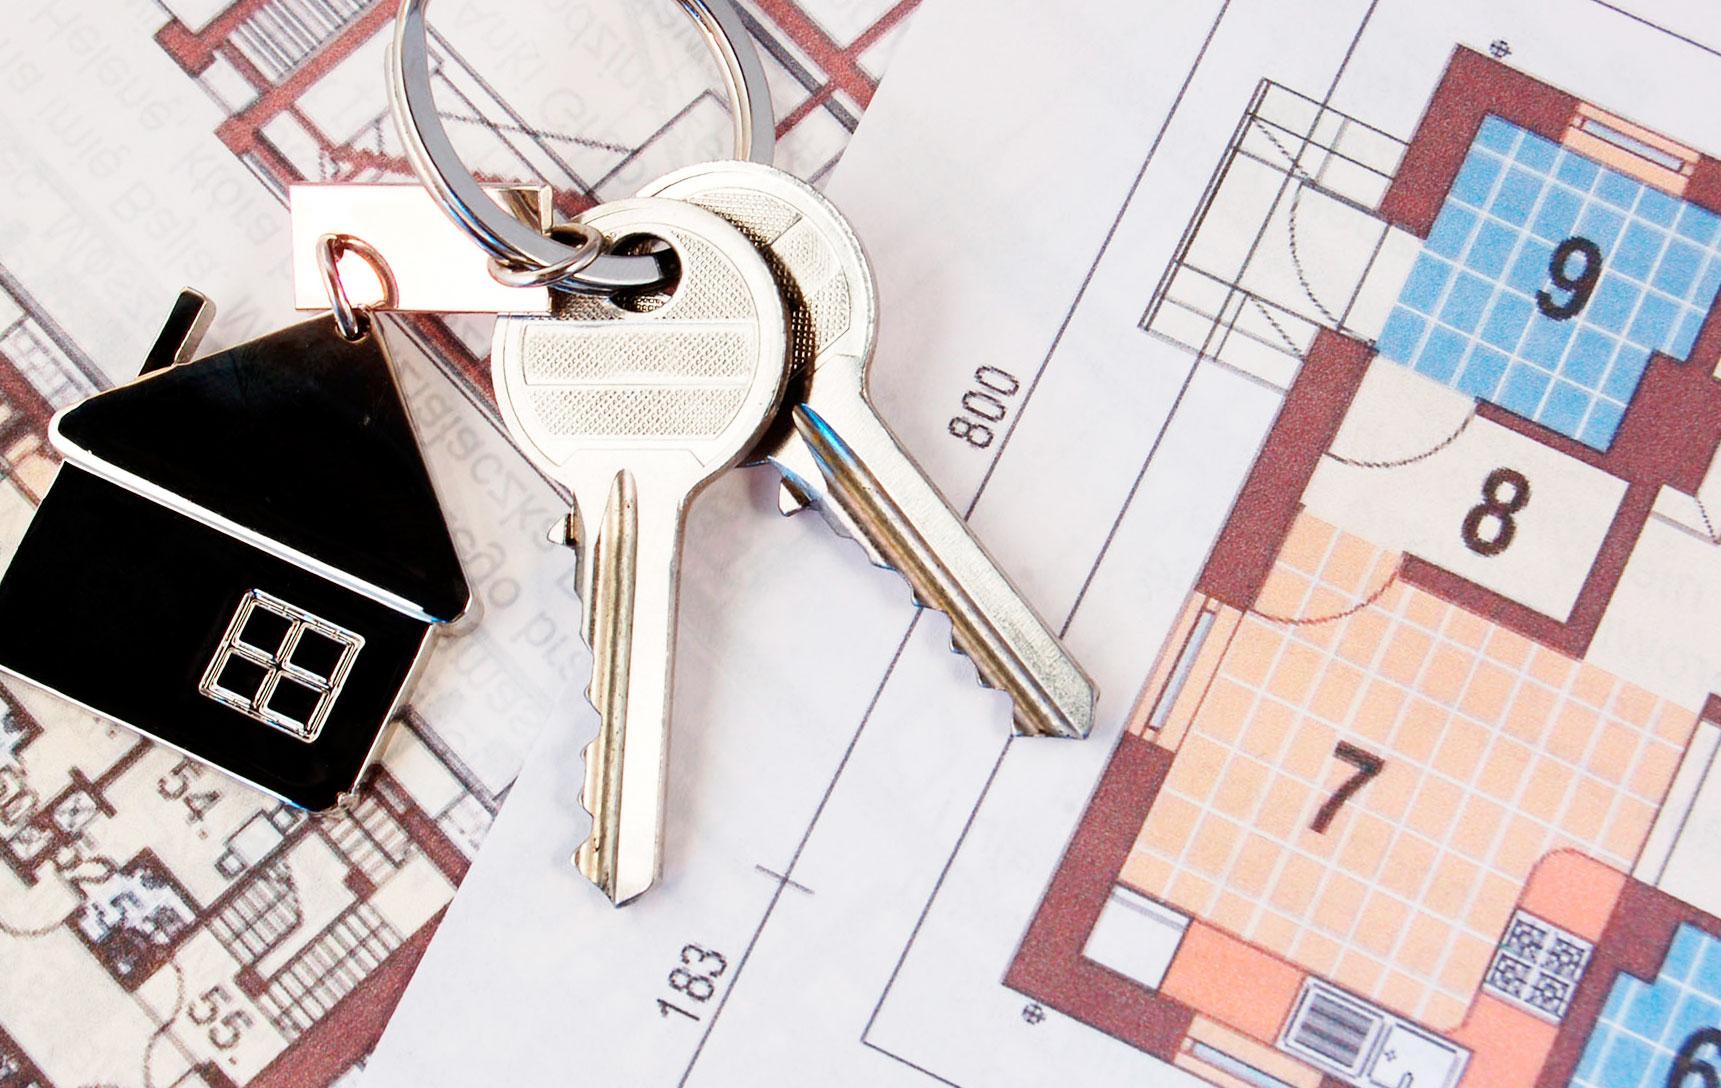 Бланк права собственности на квартиру